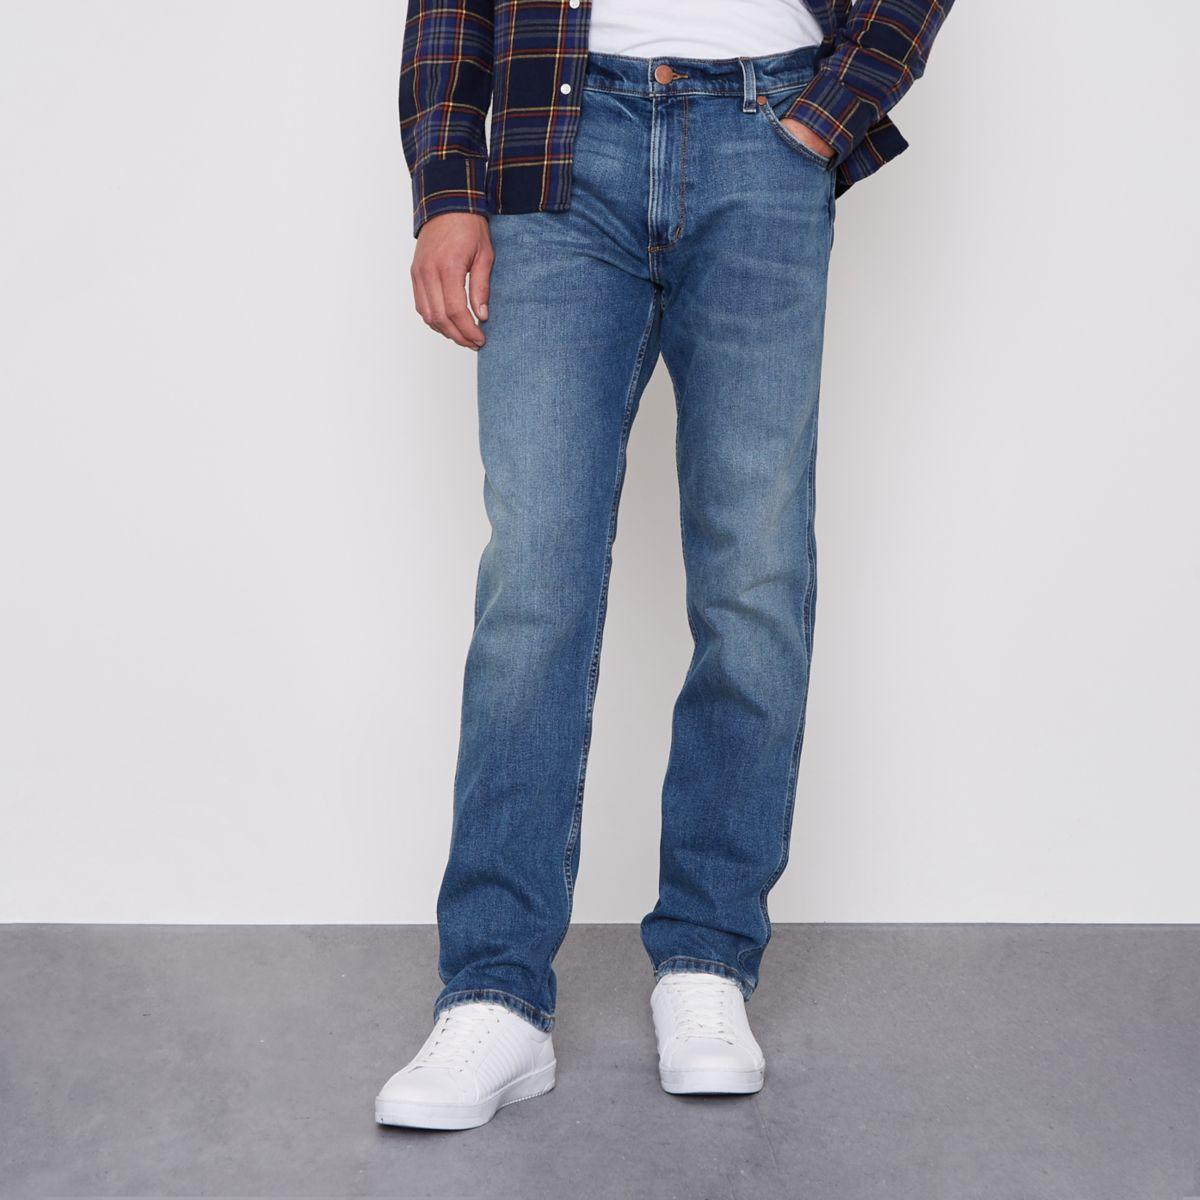 Wrangler – Greensboro – Jean droit bleu